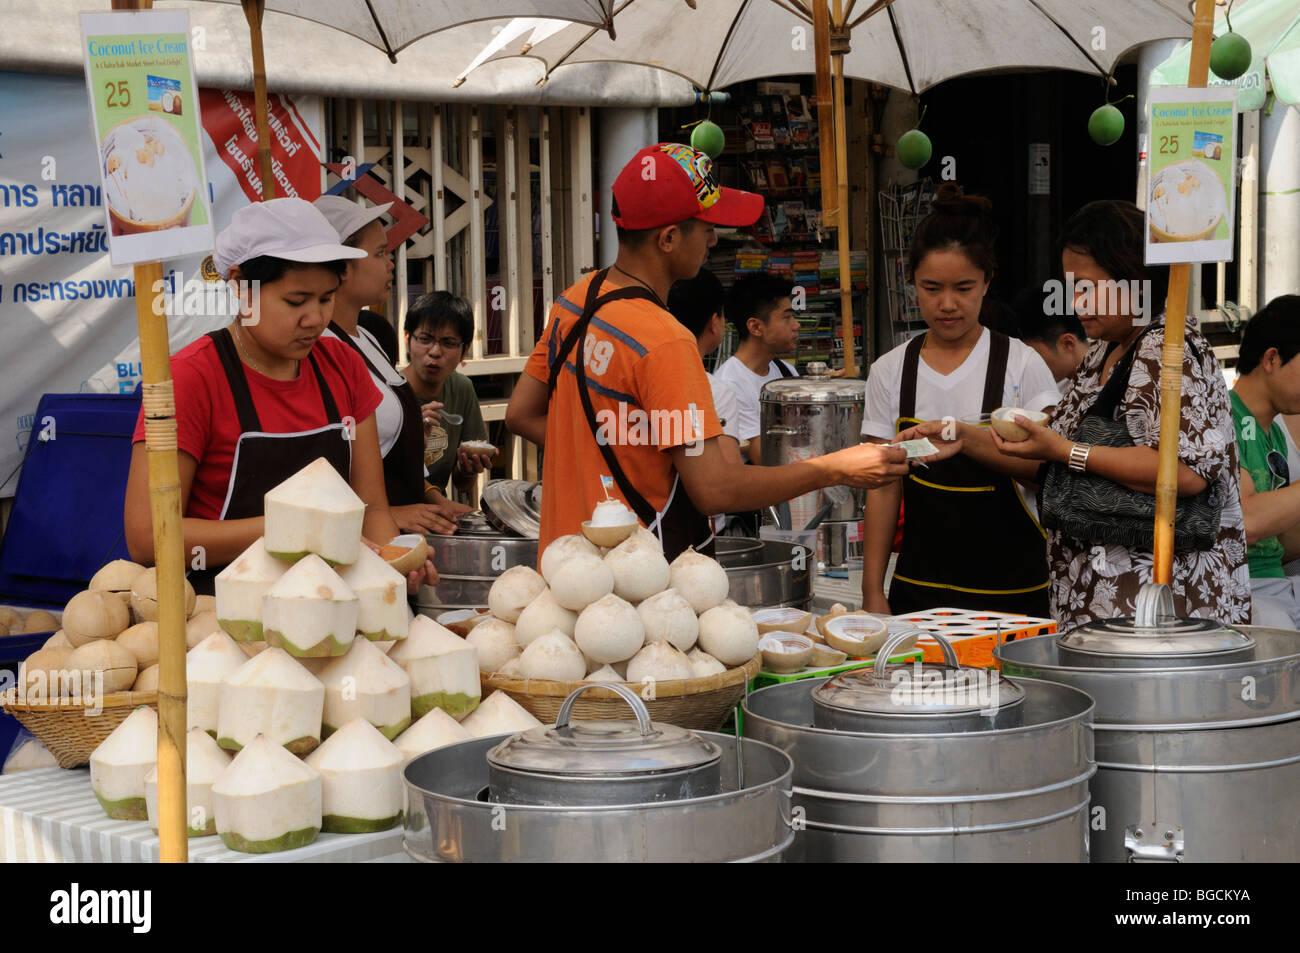 Thailand; Bangkok; Chatuchak Weekend Market; Coconut Stall - Stock Image